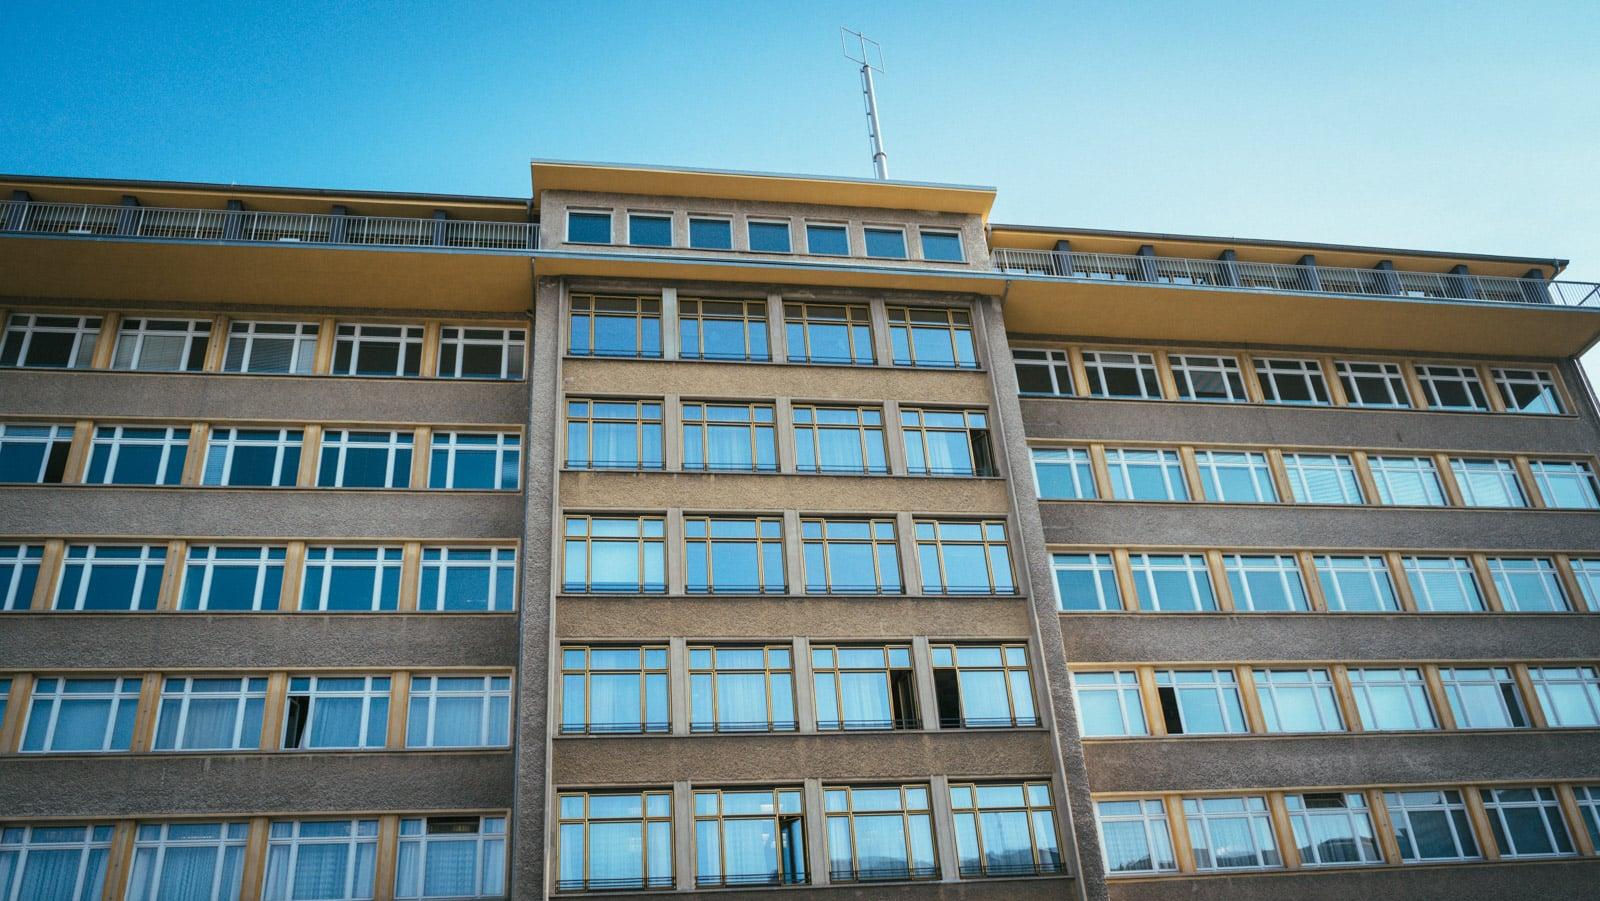 Exterior of the Stasi Museum in Berlin